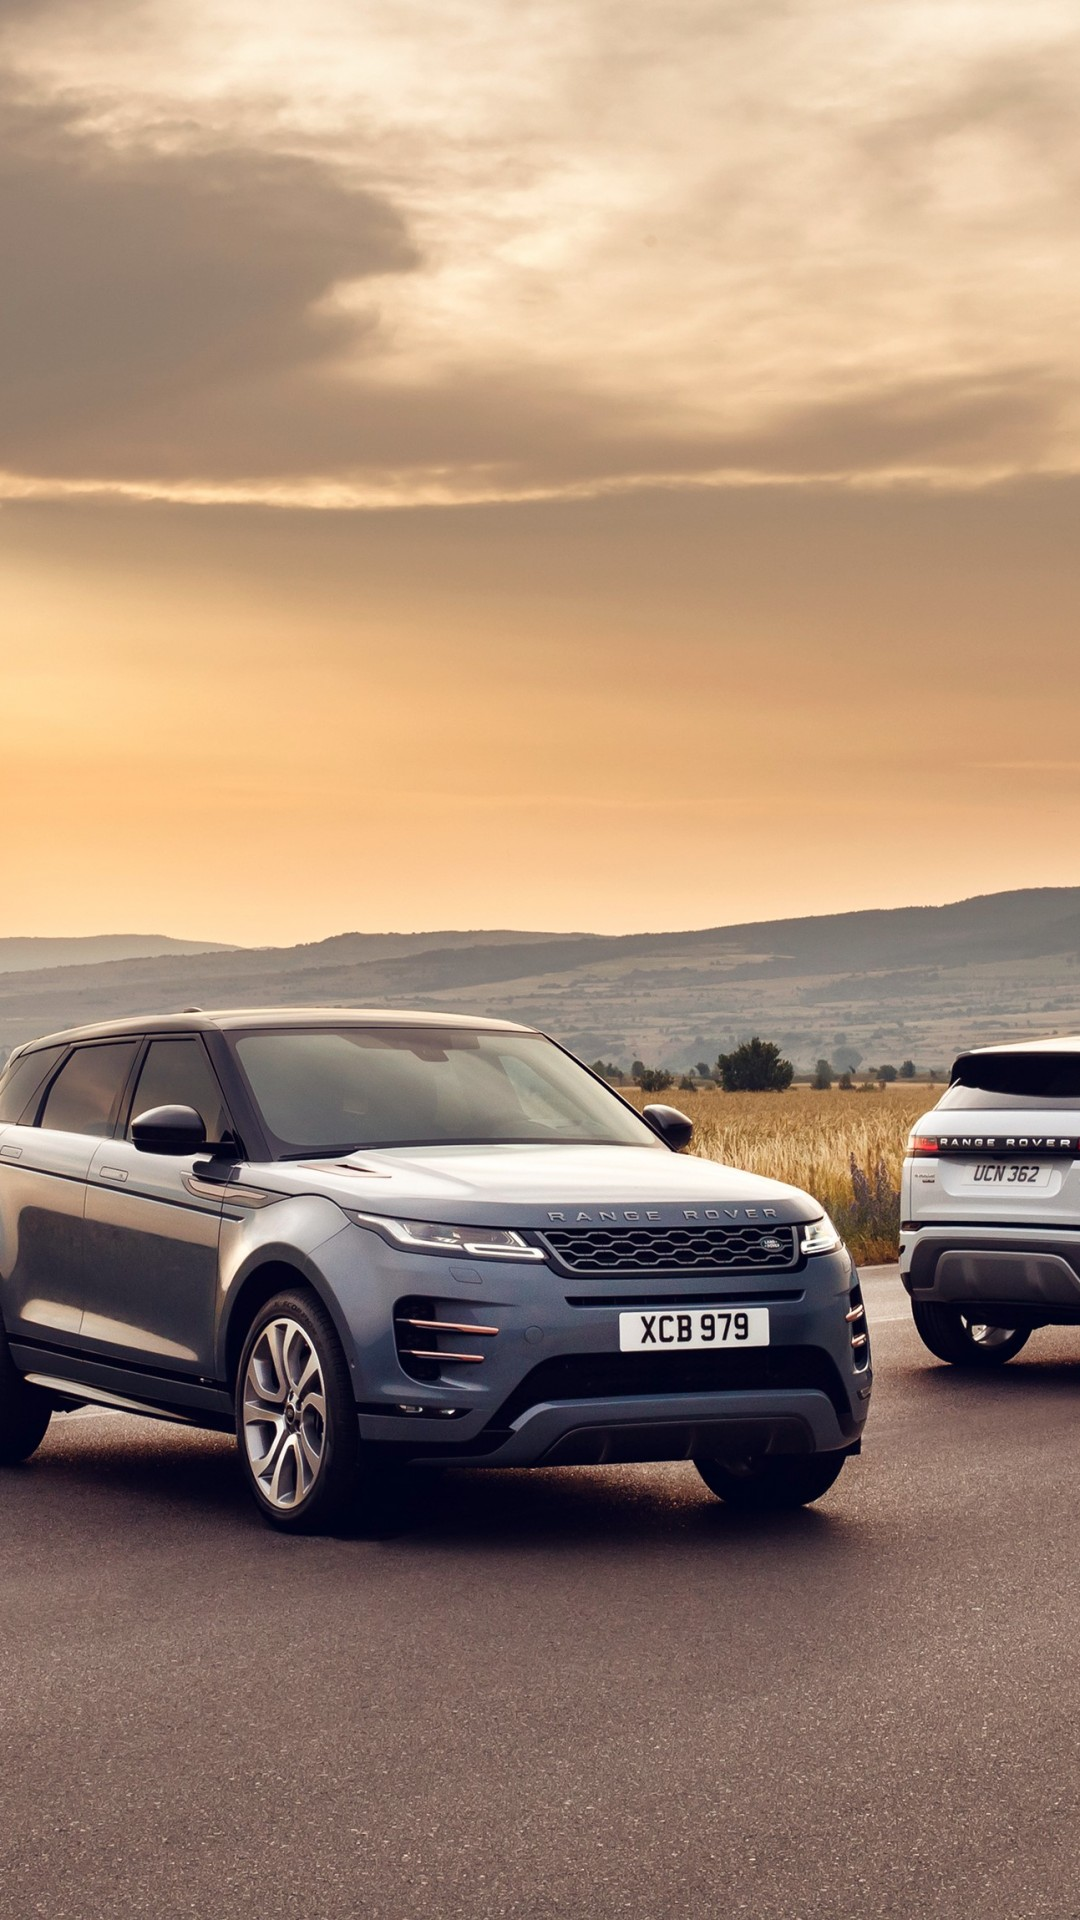 Wallpaper Range Rover Evoque Suv 2019 Cars 4k Cars